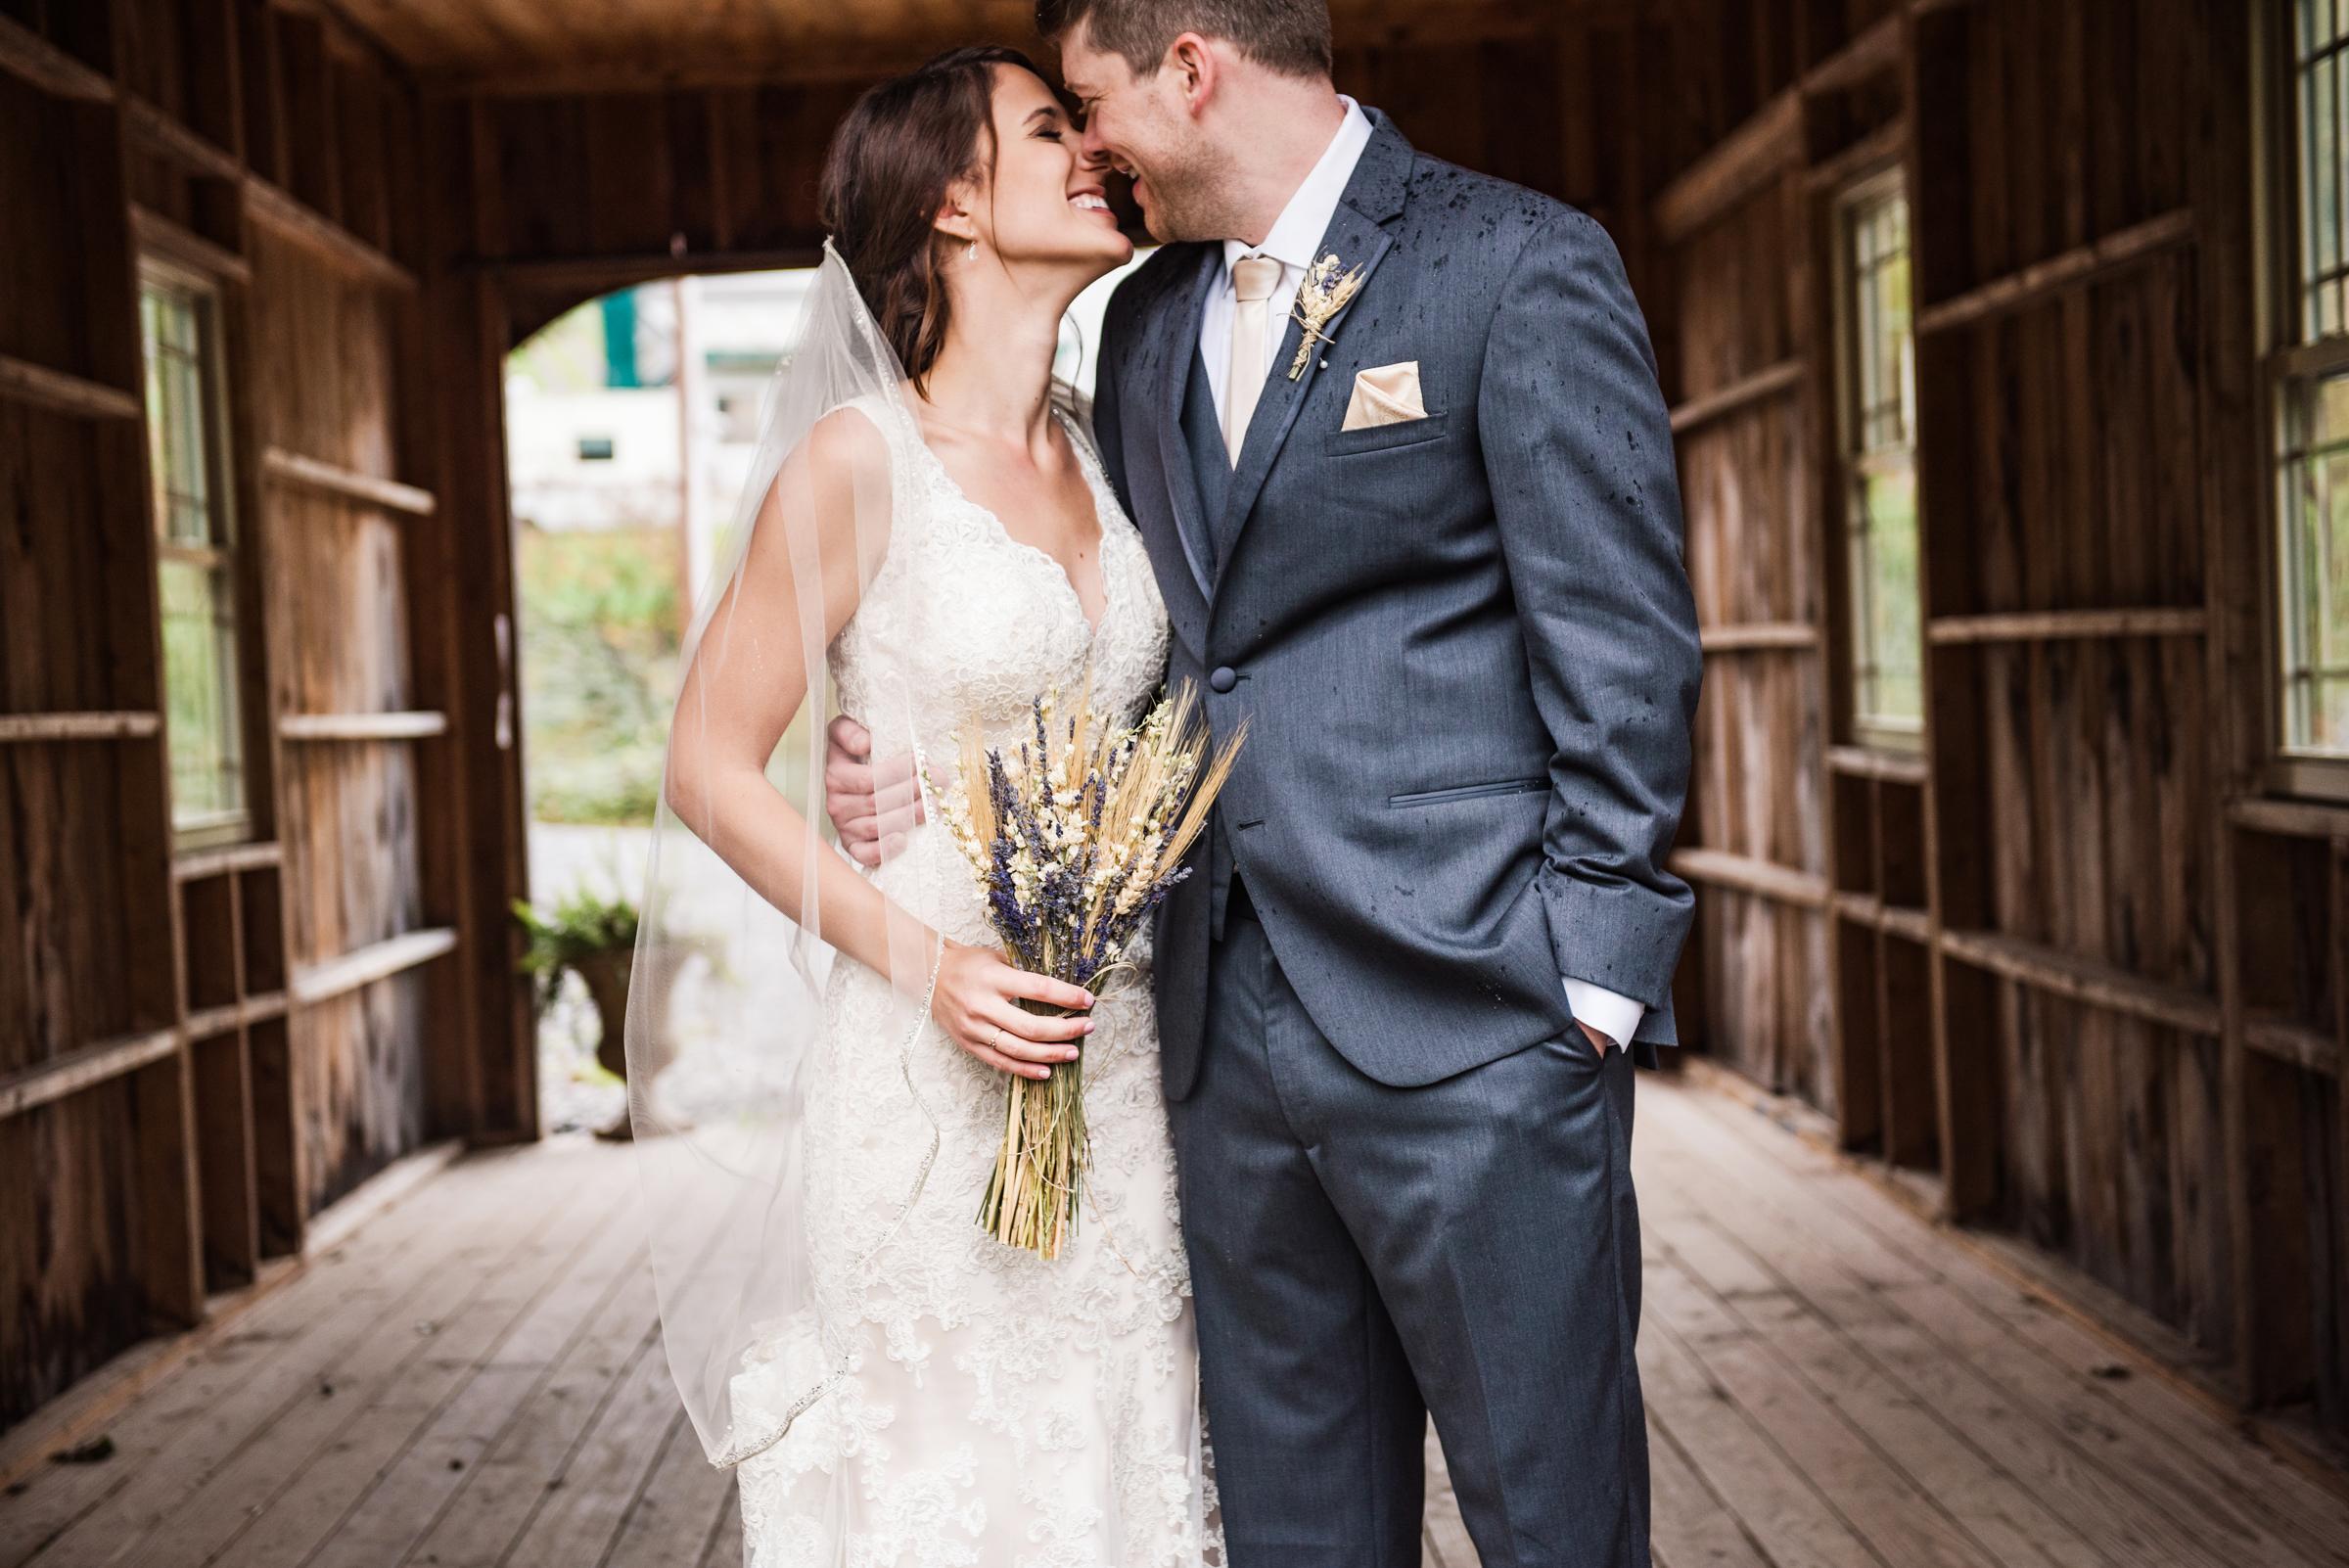 Wolf_Oak_Acres_Central_NY_Wedding_JILL_STUDIO_Rochester_NY_Photographer_DSC_7499.jpg